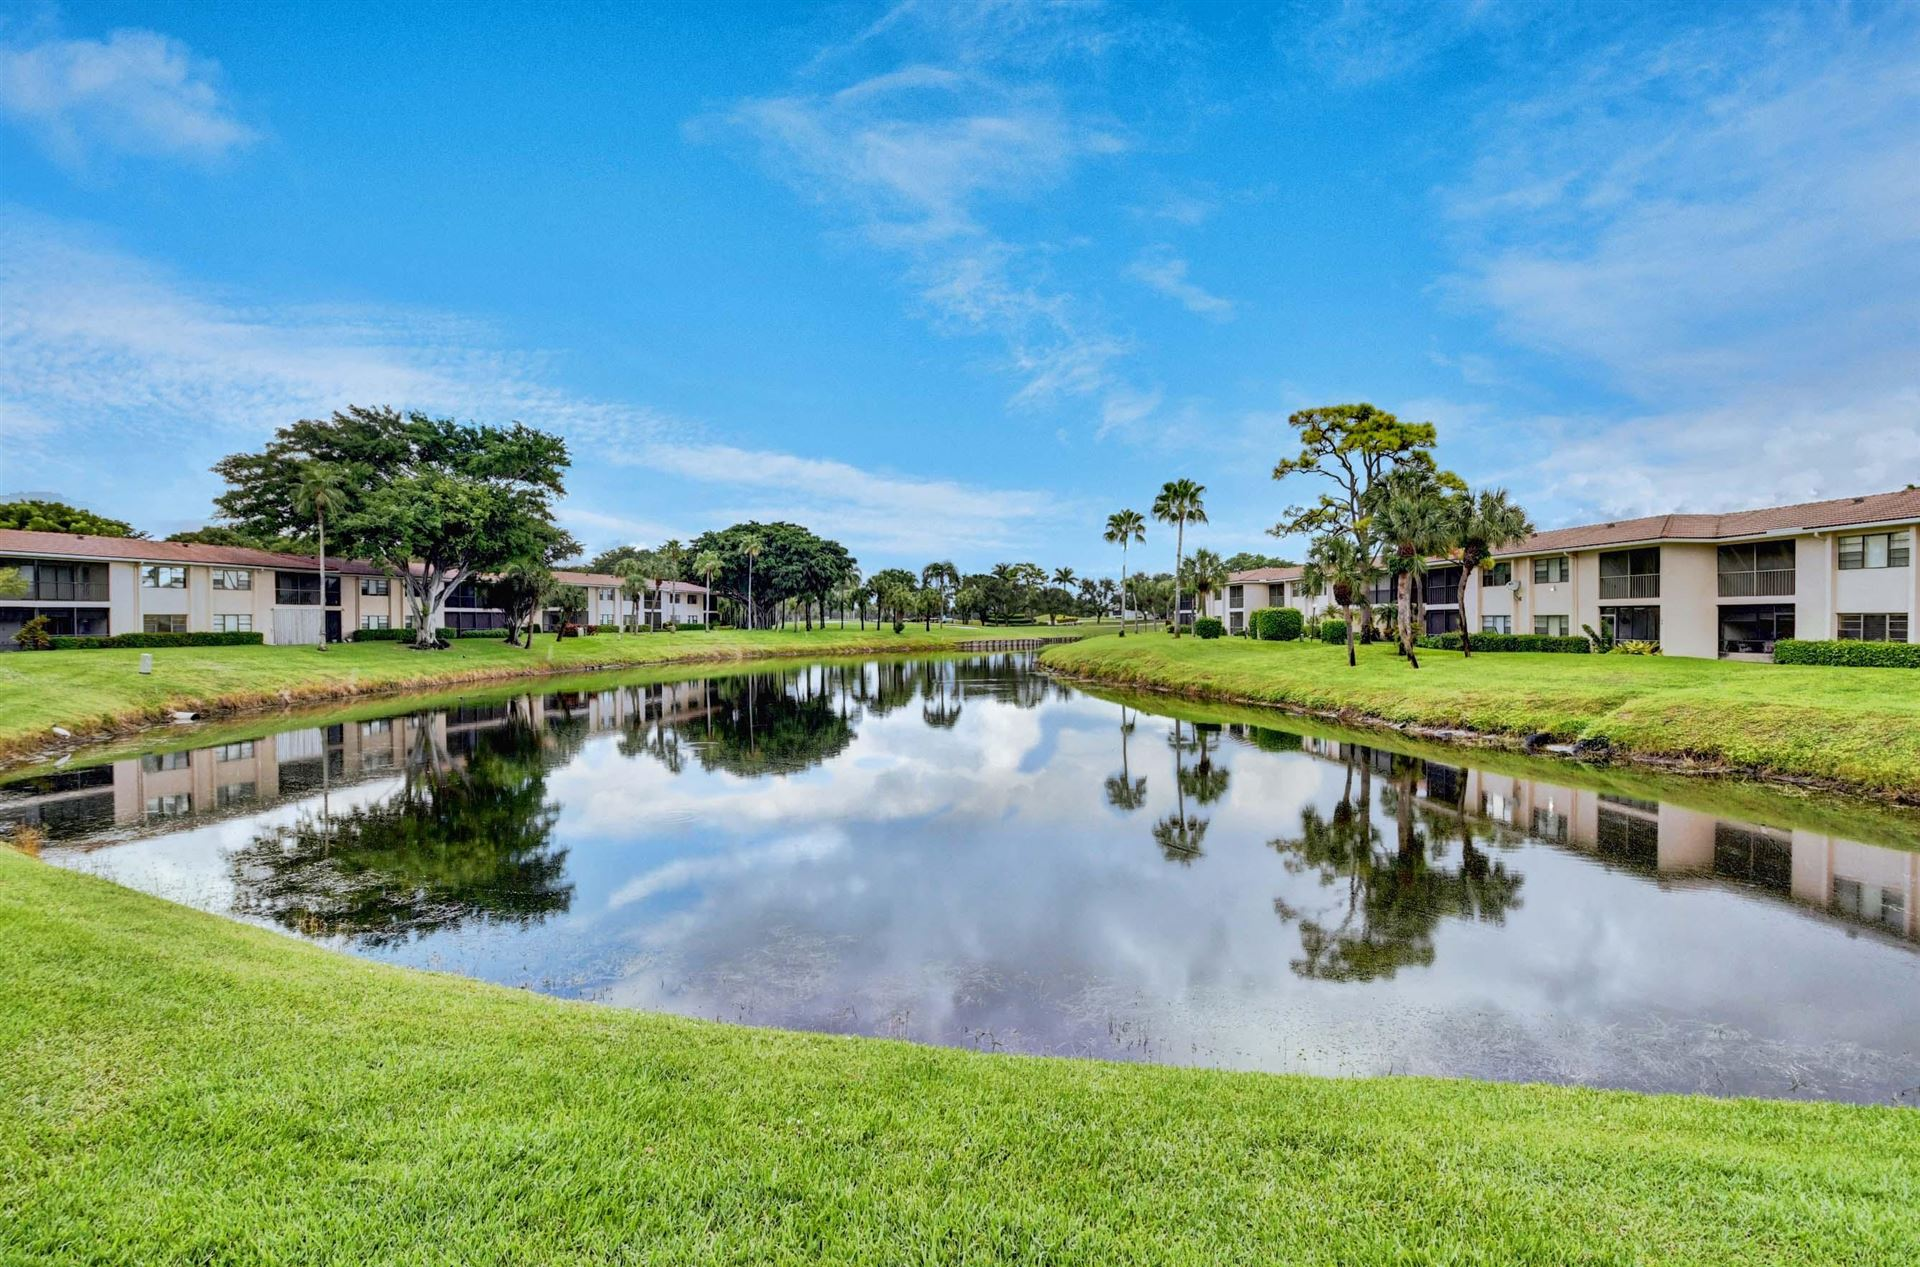 35 Southport Lane #E, Boynton Beach, FL 33436 - #: RX-10659726